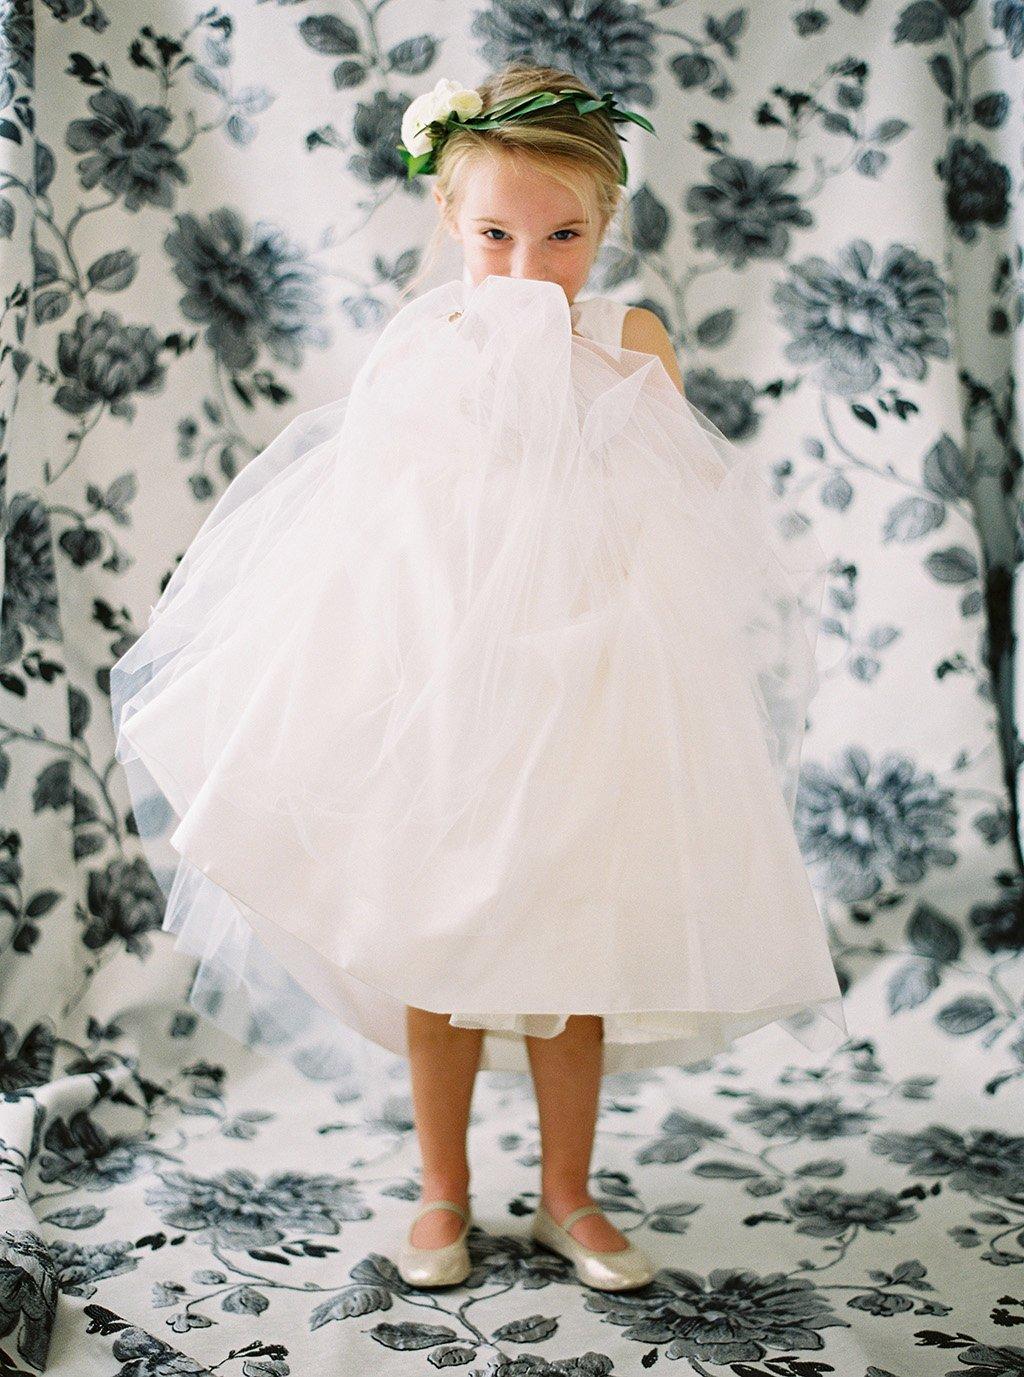 Amelia_Johnson_Photography_Antonella&Matthew_wedding0002.1